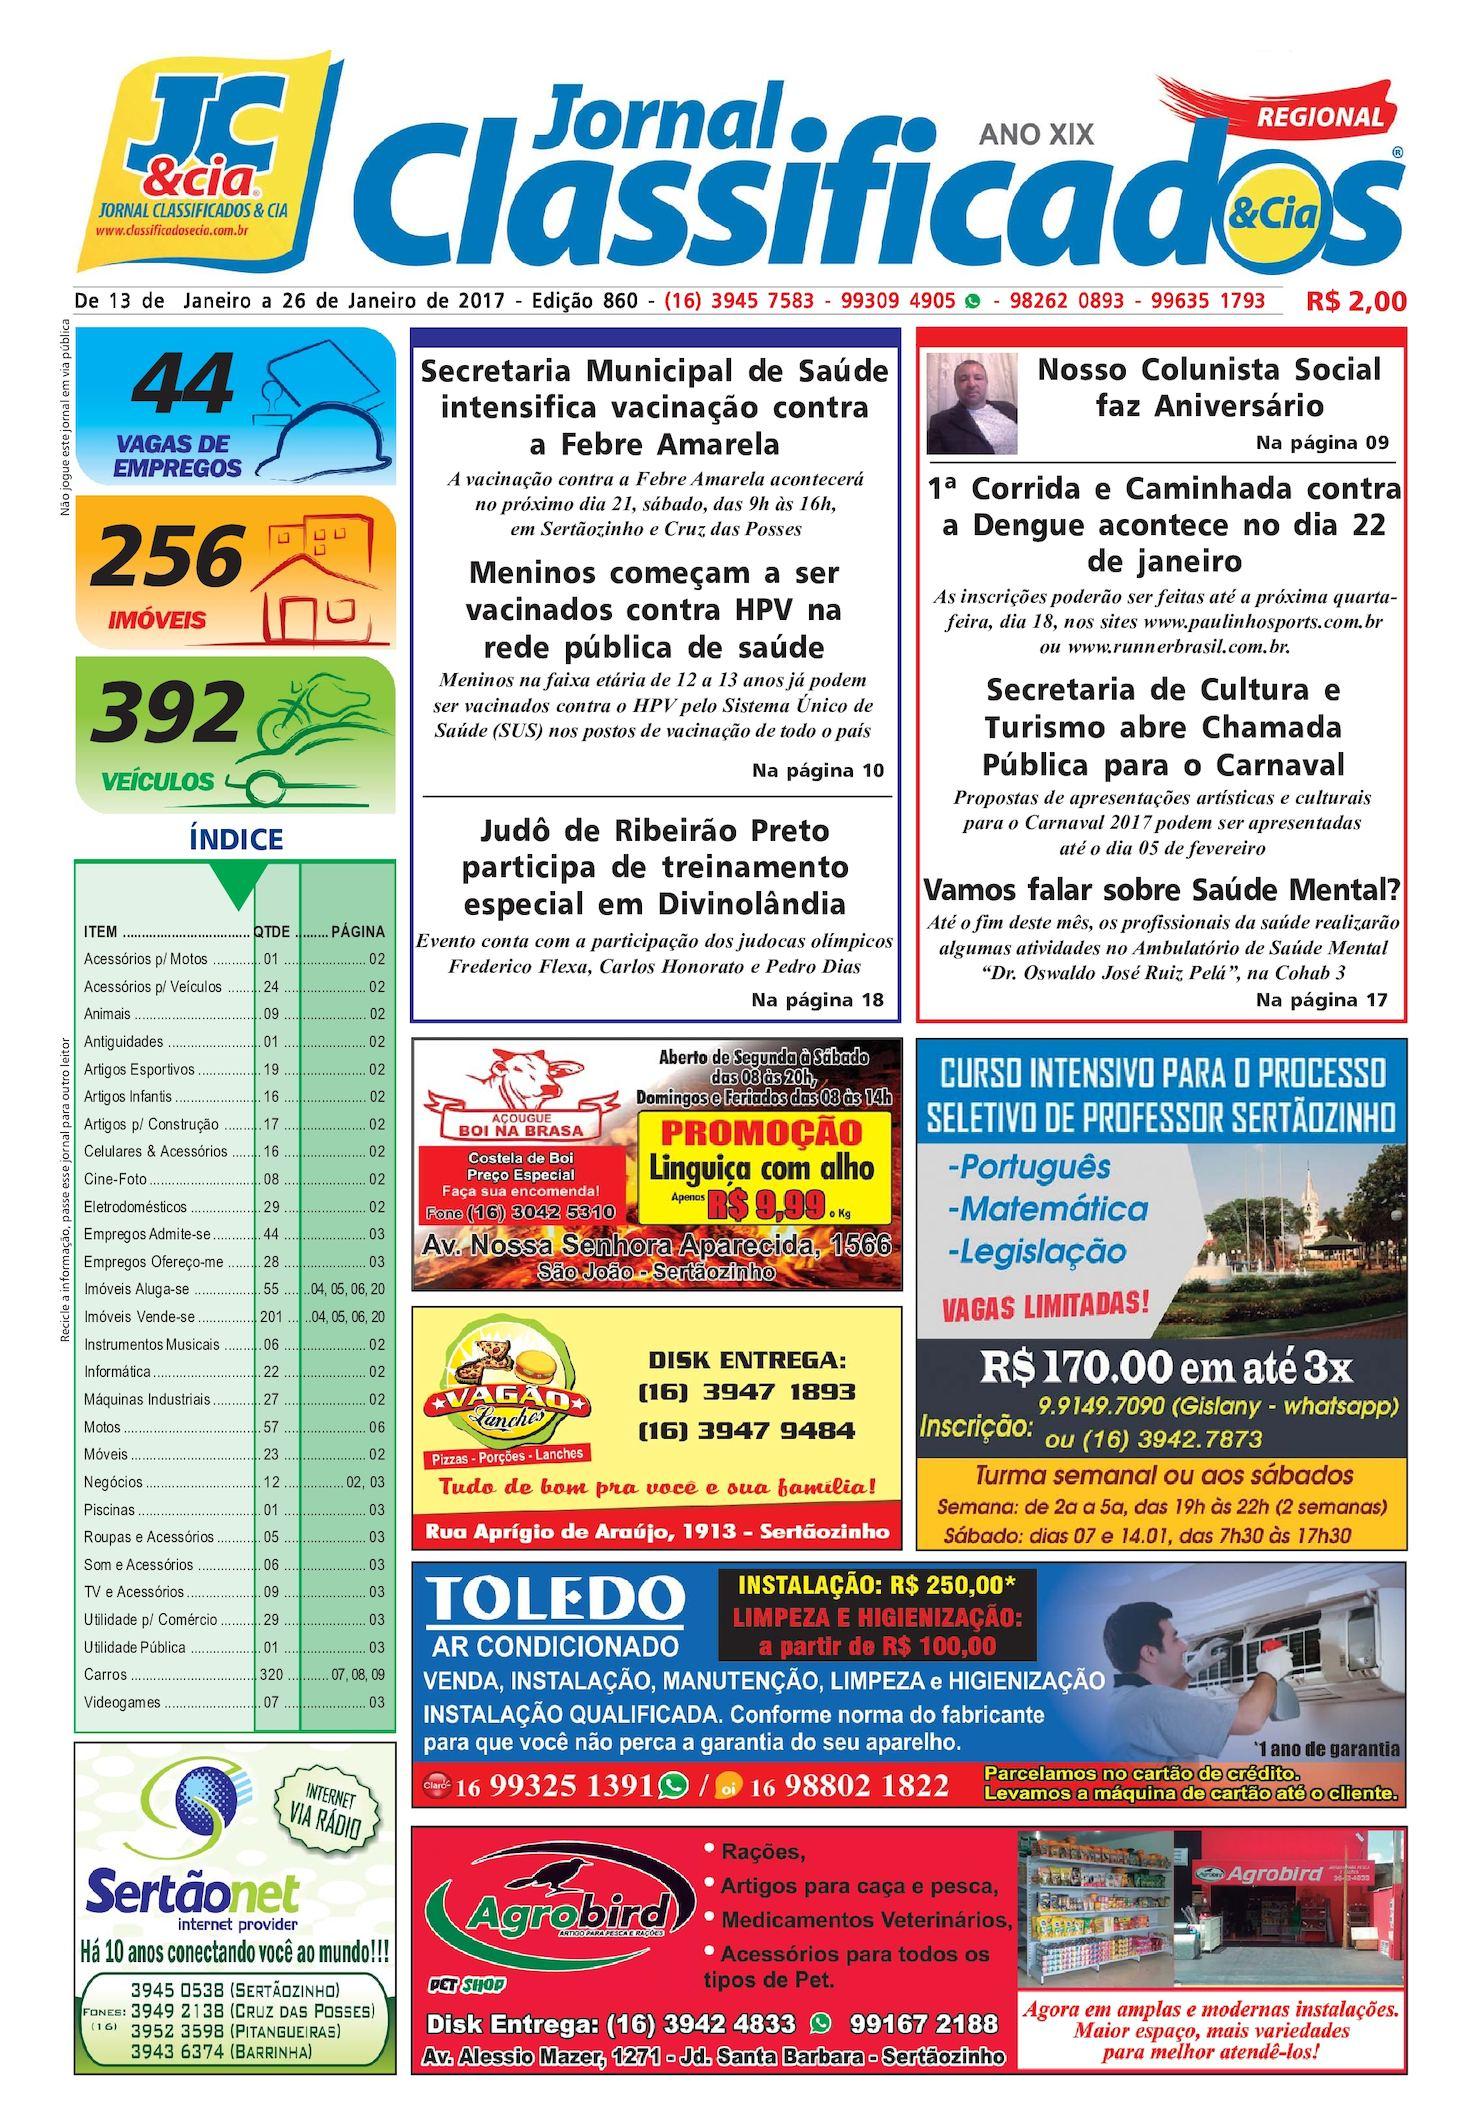 Calaméo - Regional 860 82a362975d9fa